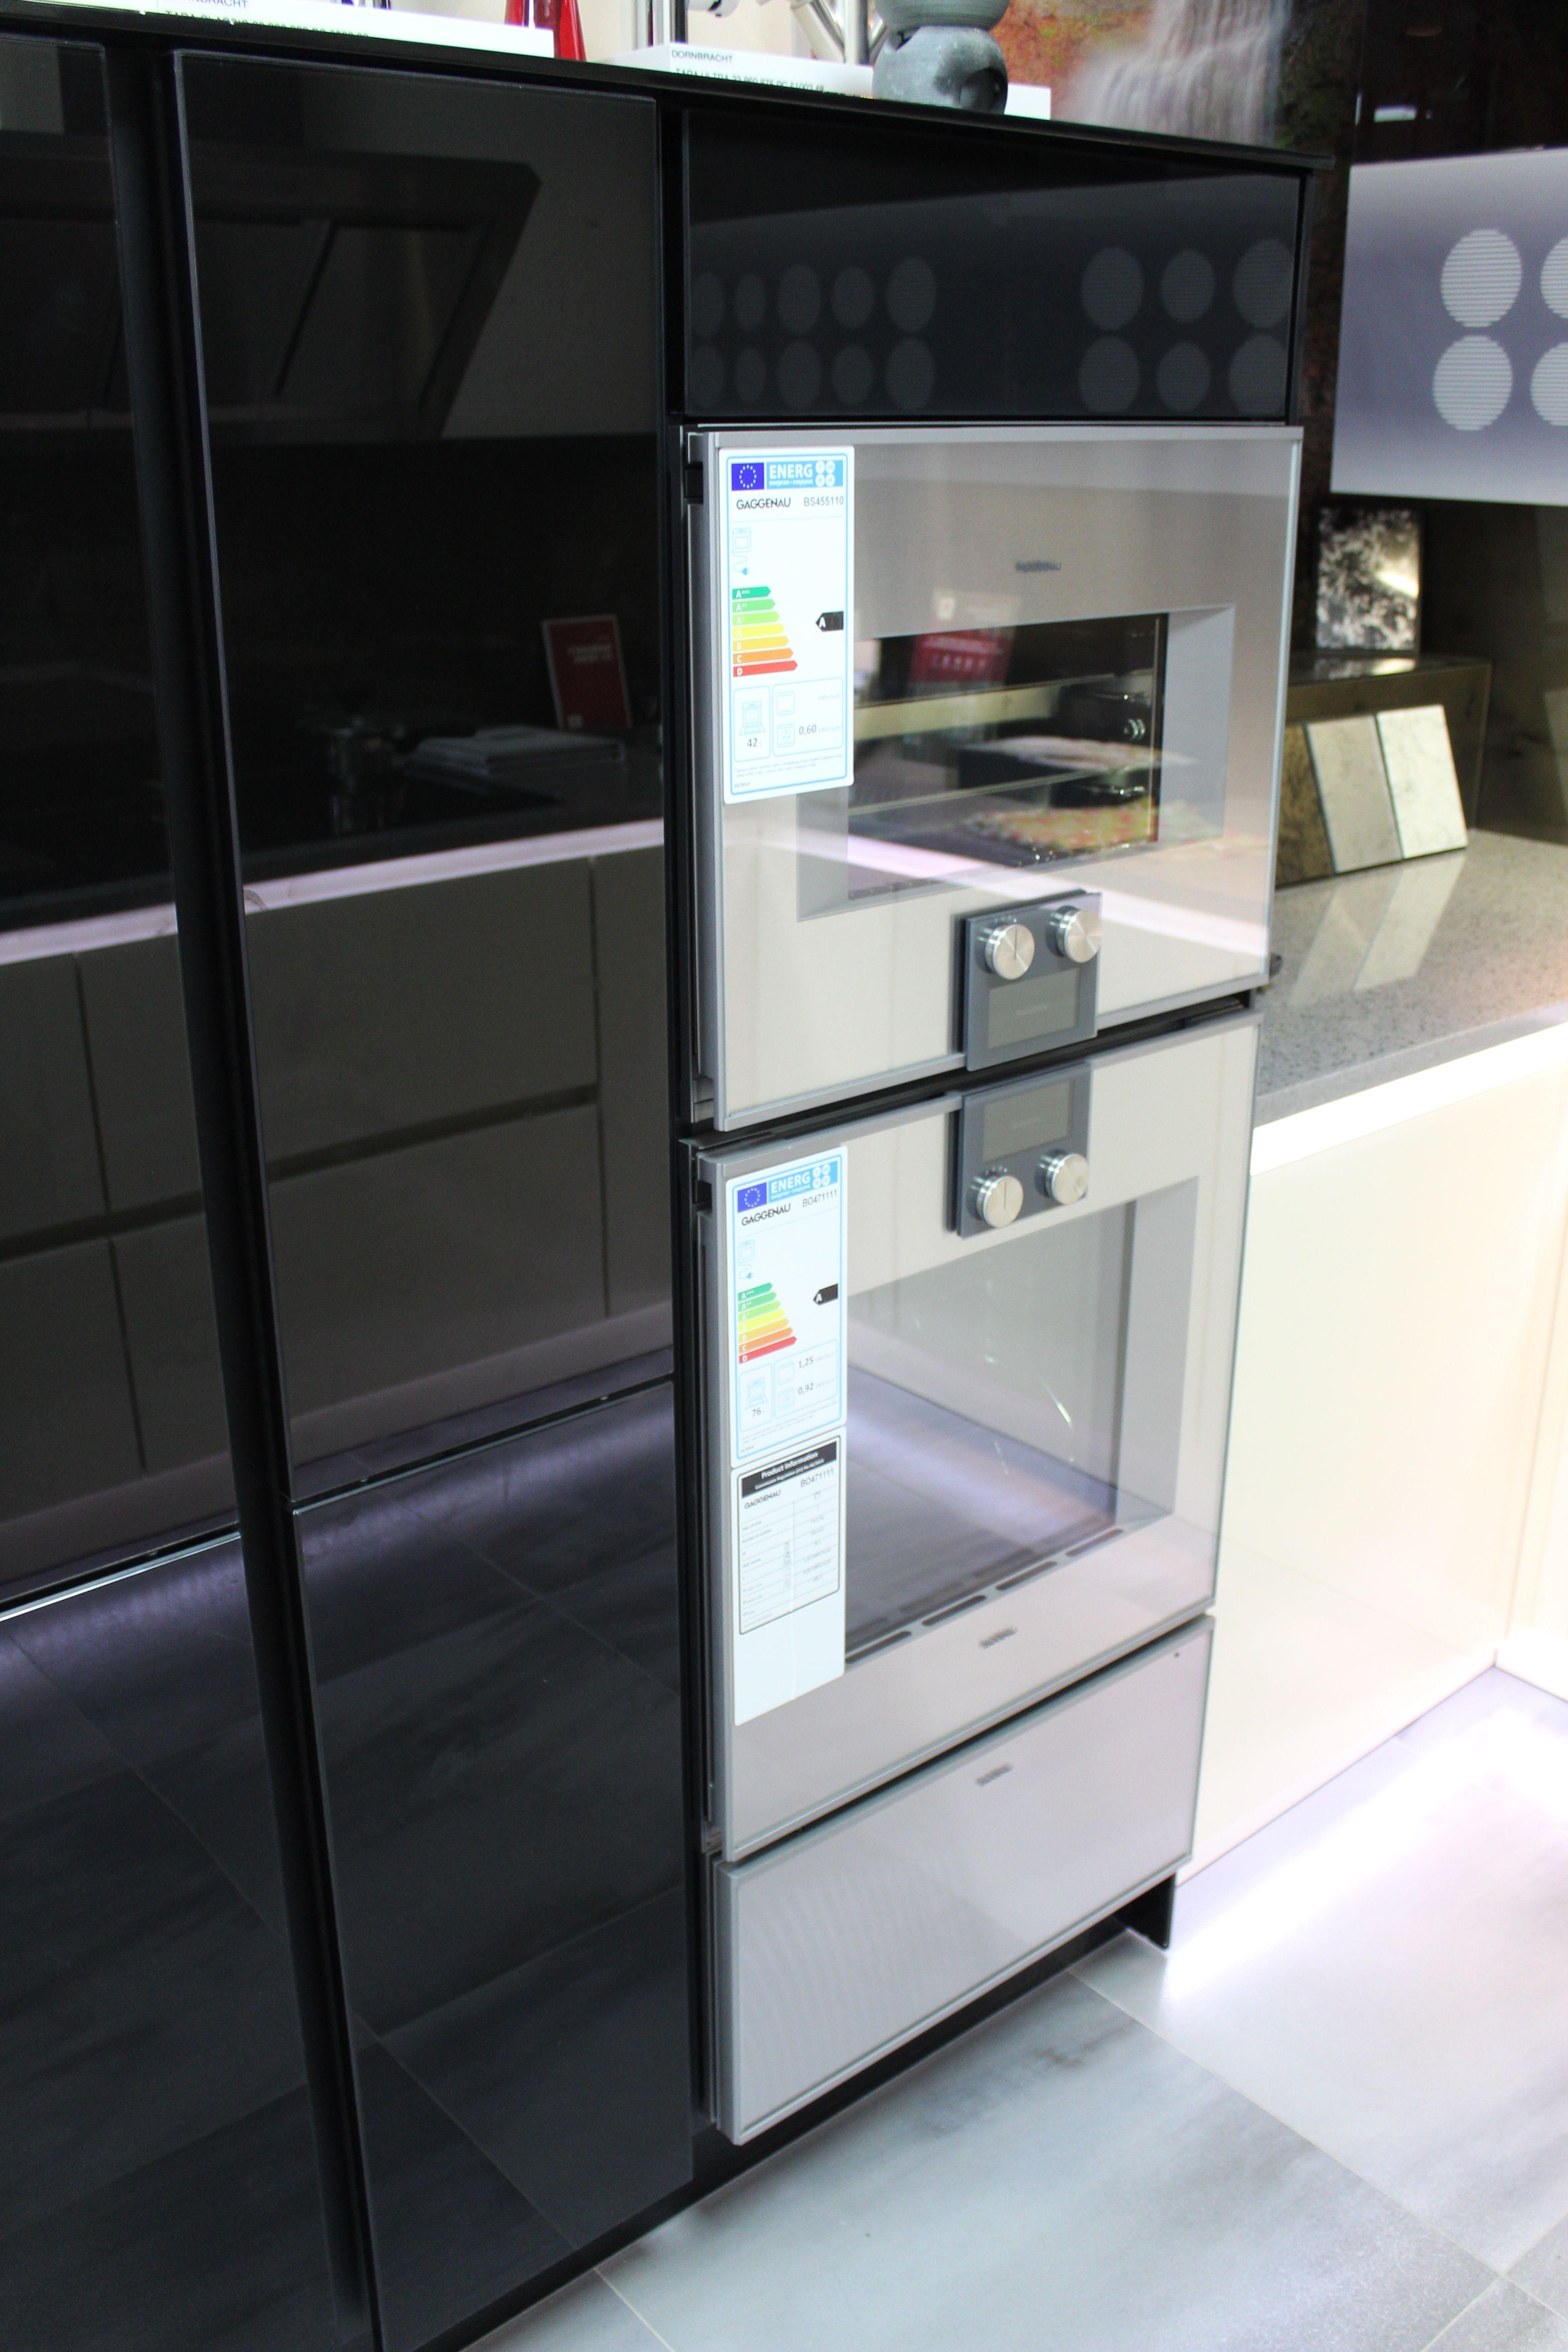 gaggenau 400 series combi steam oven bs455110 oven. Black Bedroom Furniture Sets. Home Design Ideas